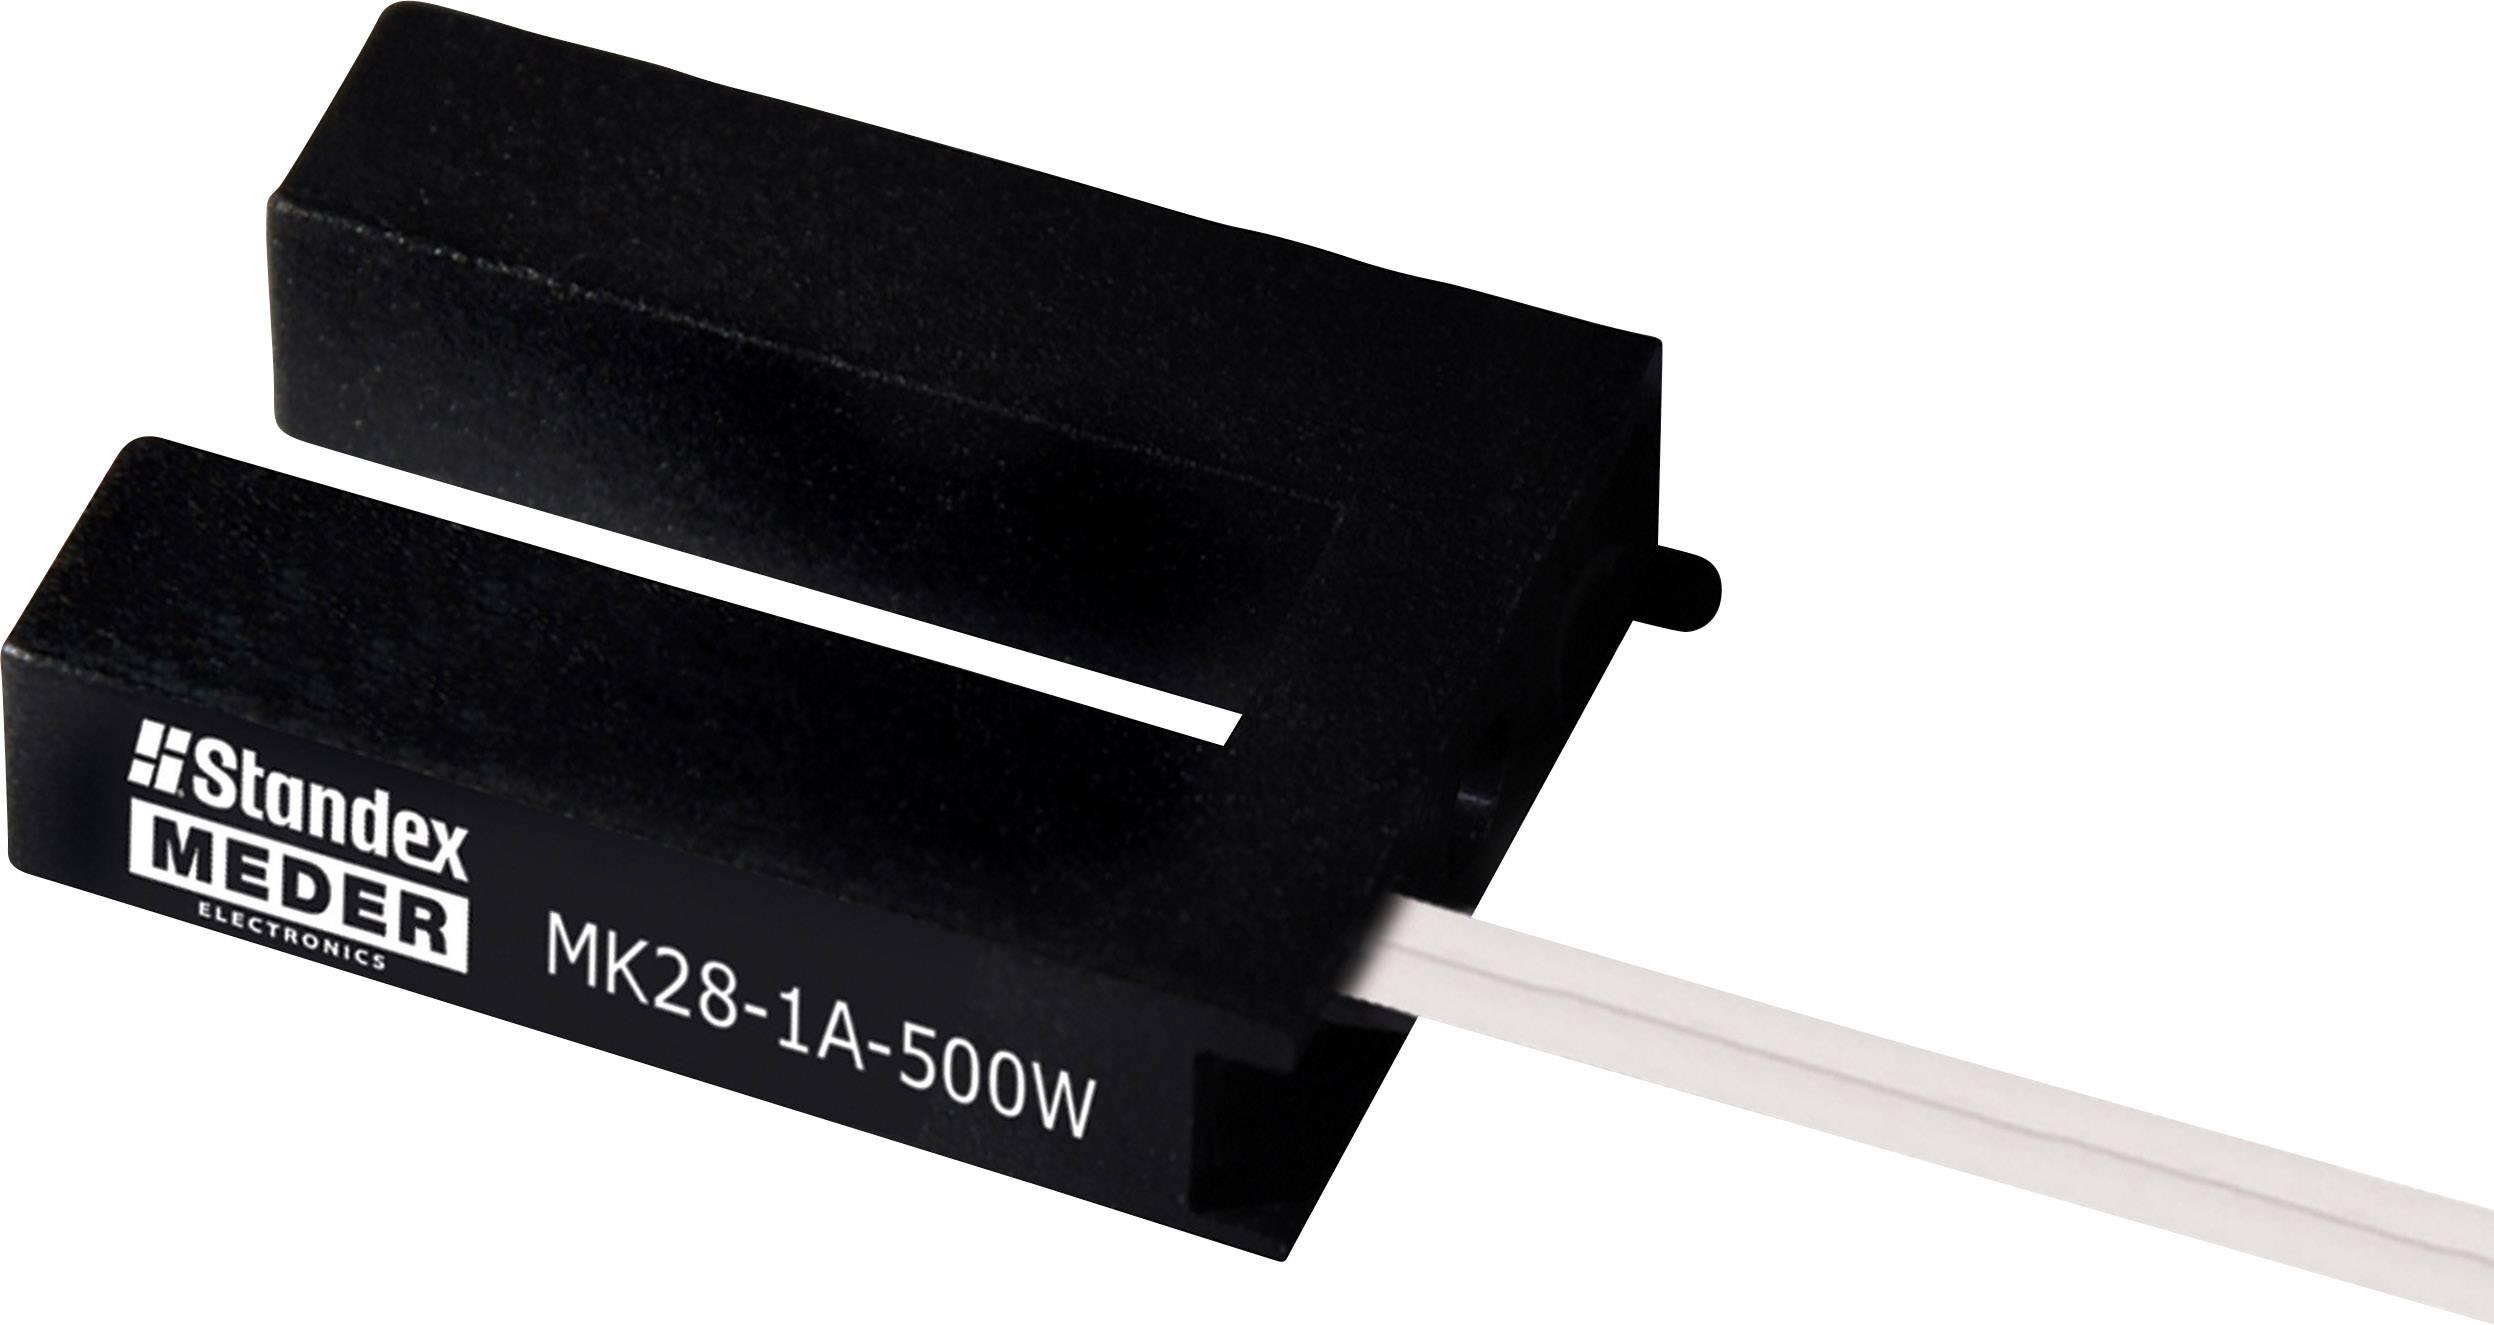 Jazyčkový kontakt StandexMeder Electronics 9283901054, 1 prepínací, 175 V/DC, 175 V/AC, 1 A, 10 W